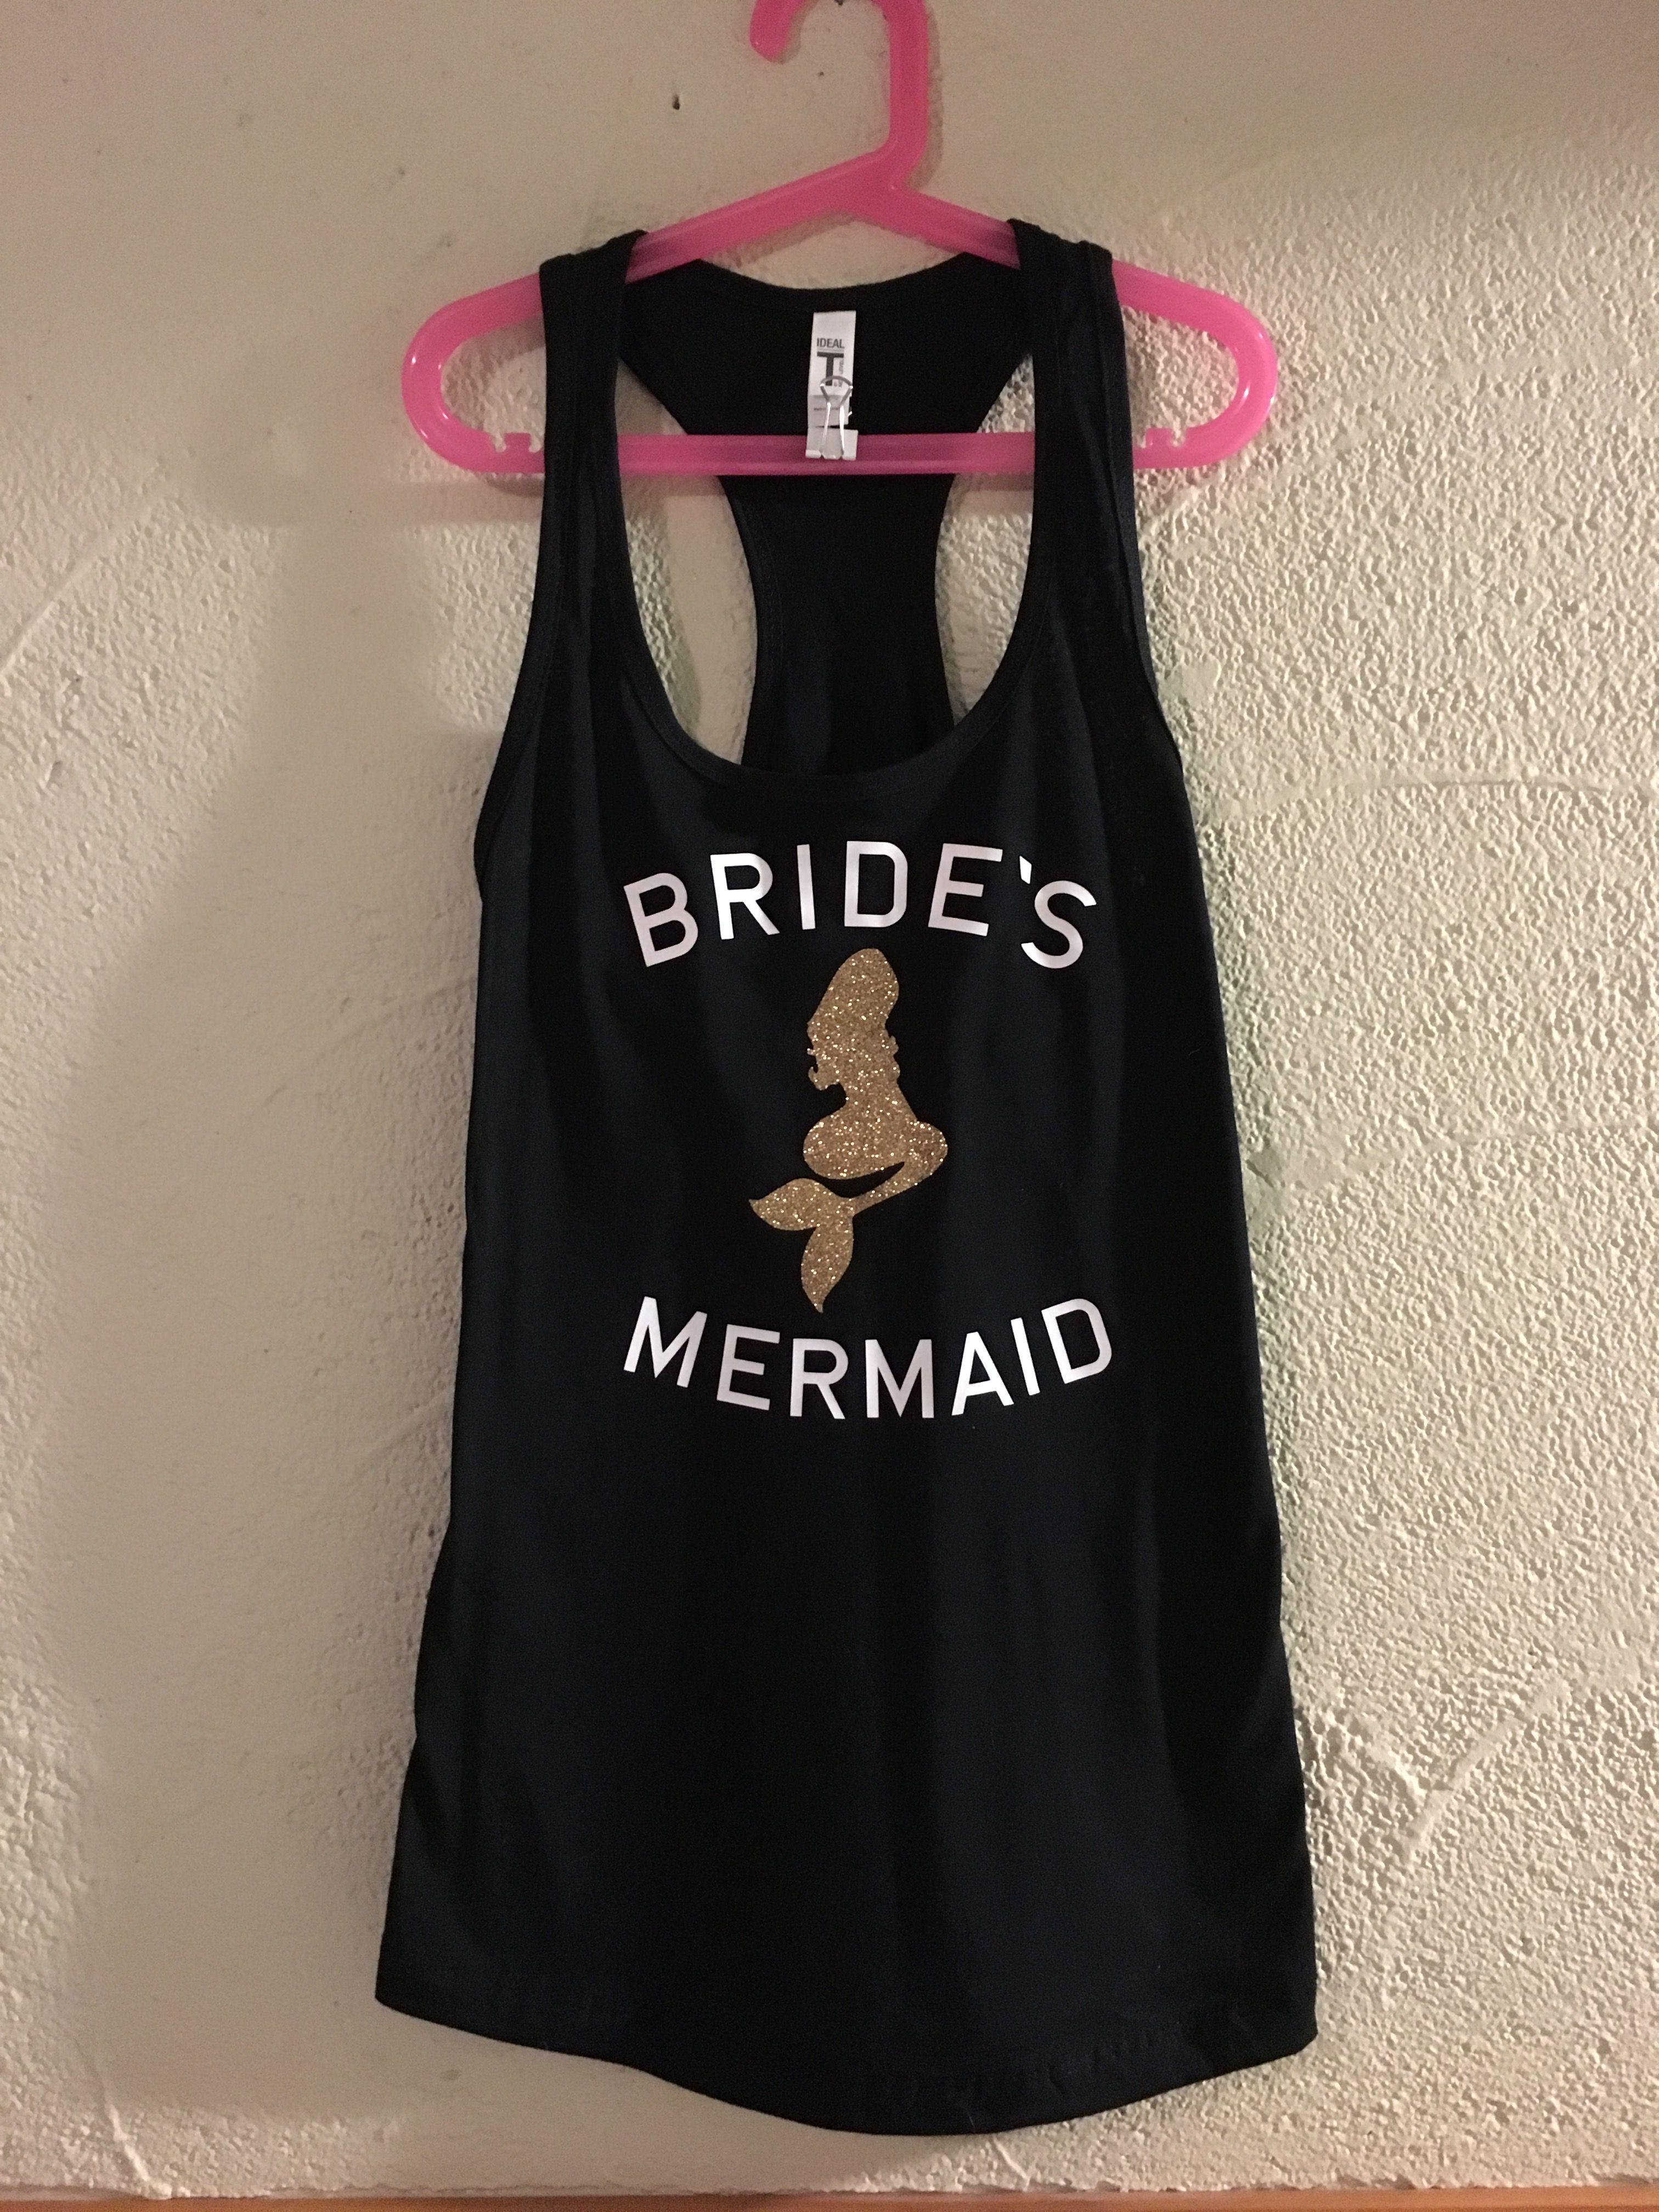 daa4c28ef Brides mermaid custom tank, bridal party custom tank tops Custom Tank Tops,  Bridal Shirts